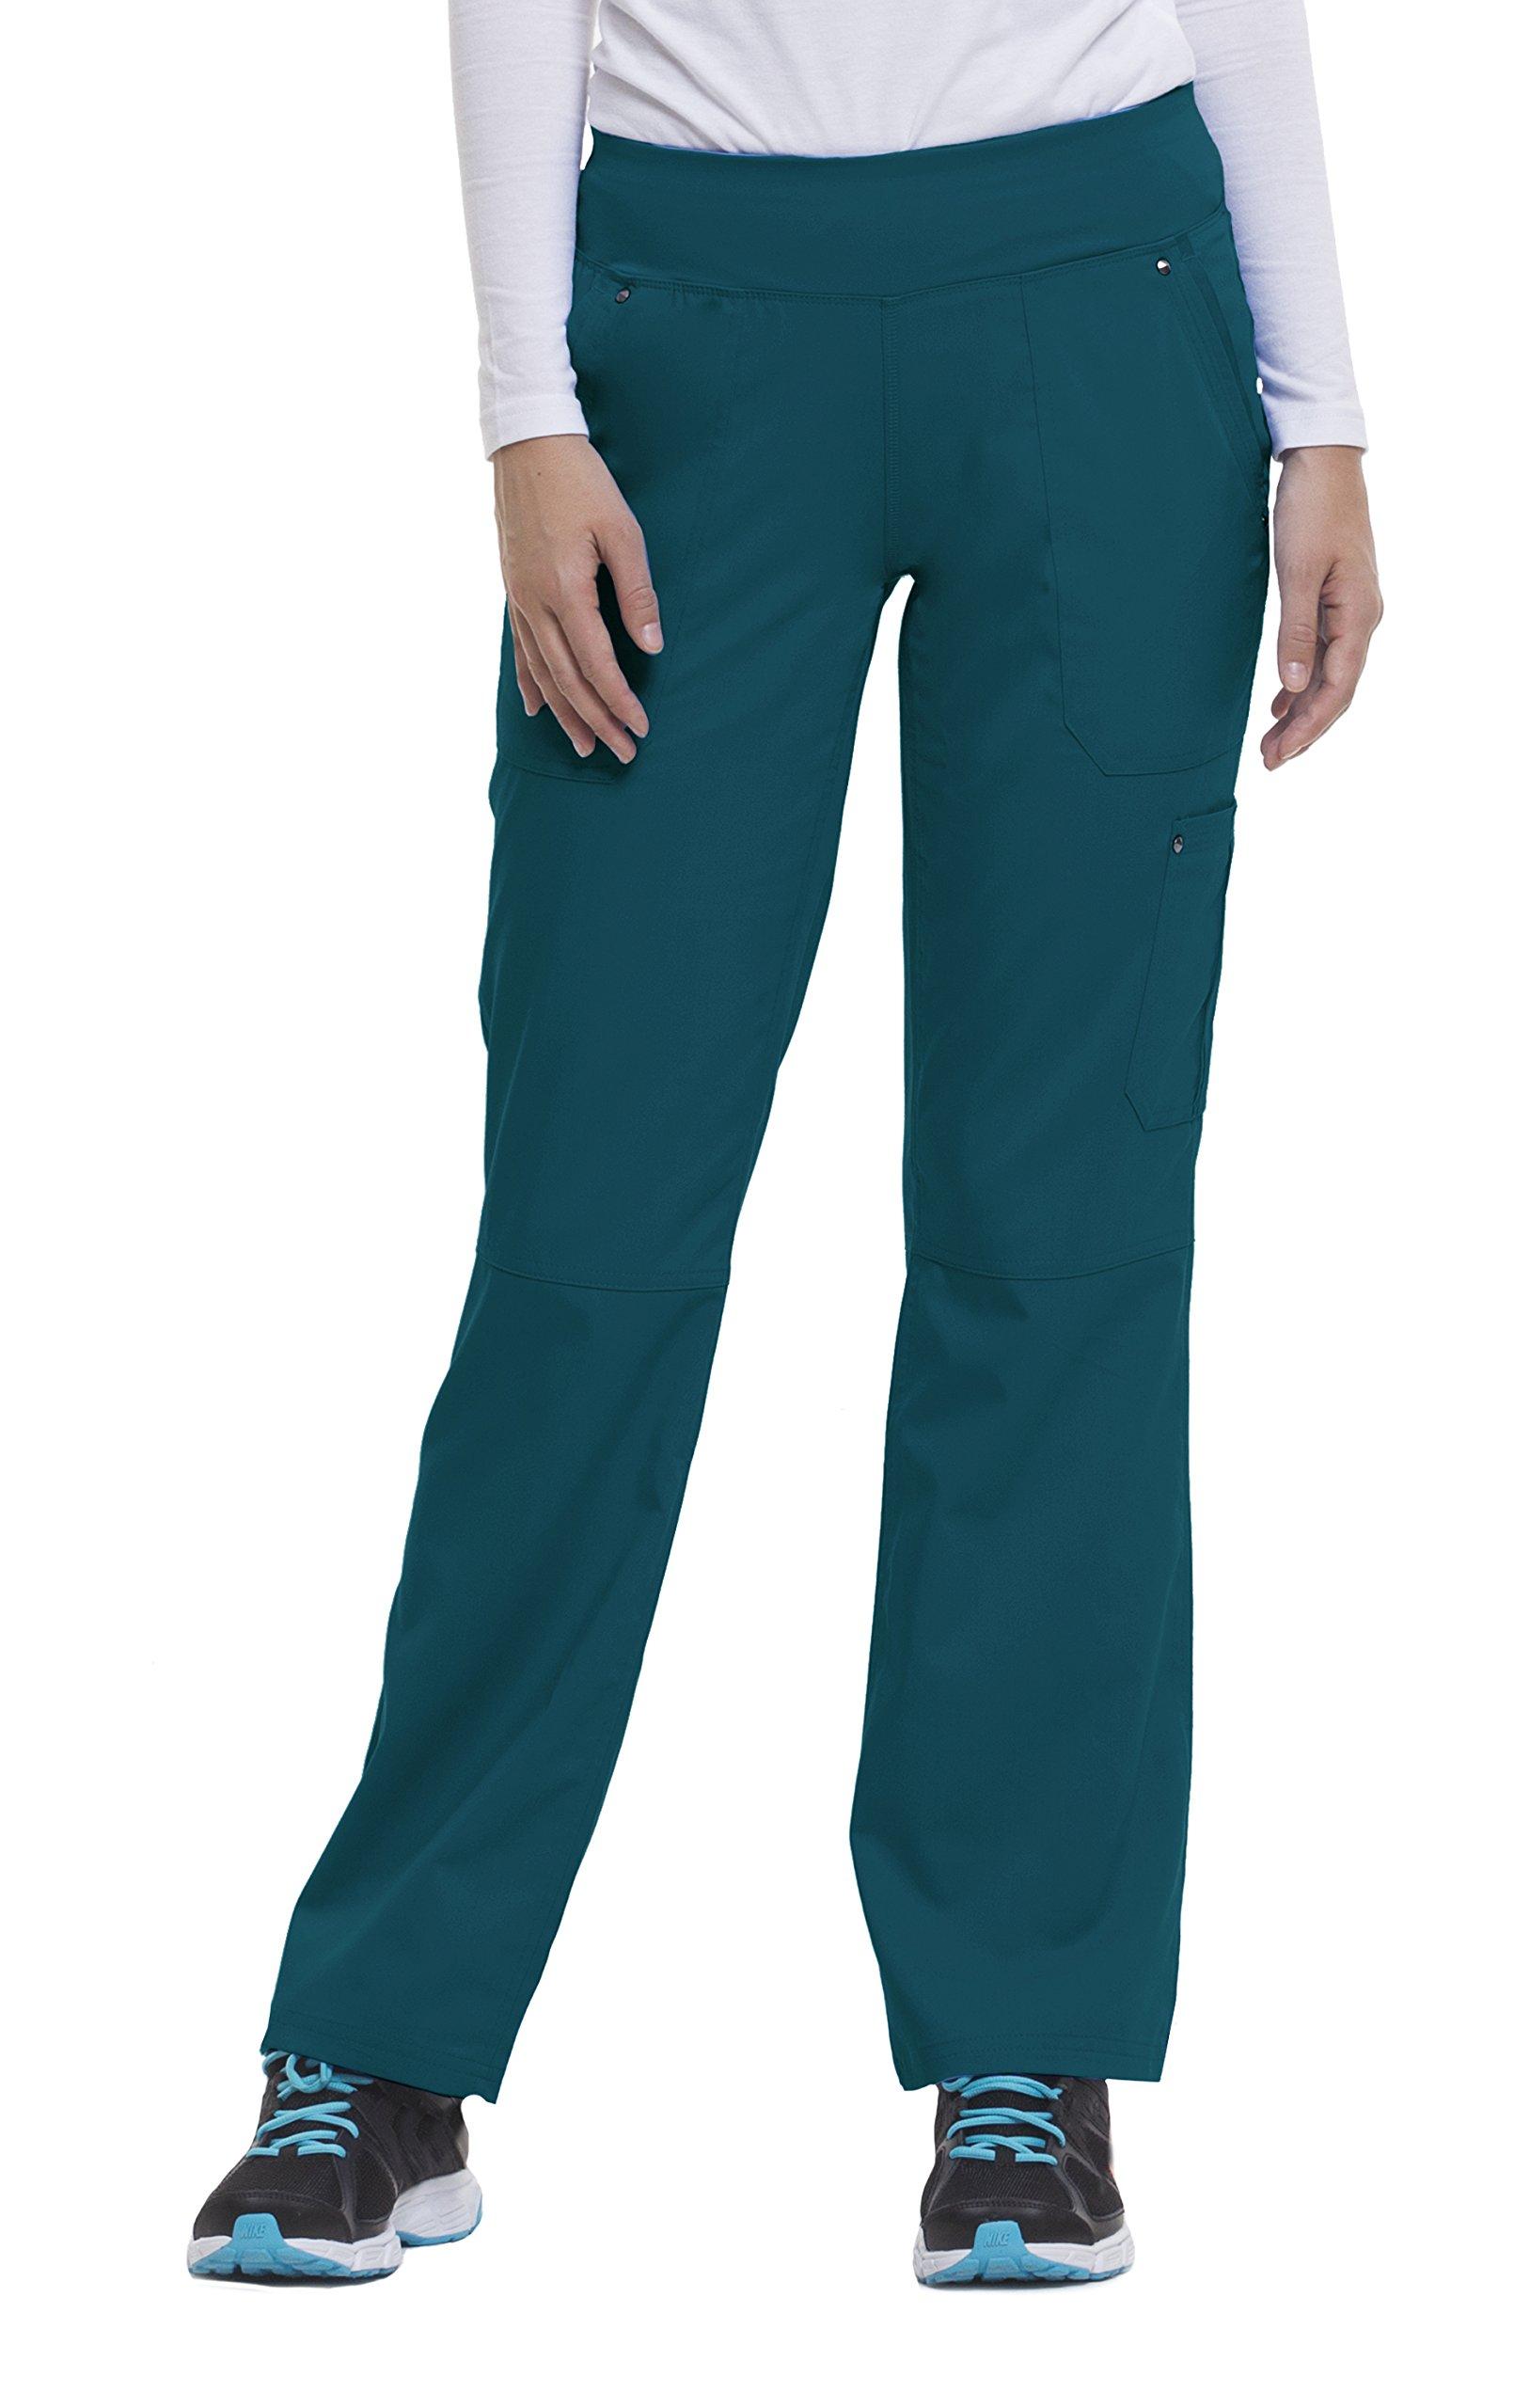 Purple Label Yoga Women's Tori 9133 5 Pocket Knit Waist Pant by Healing Hands- Caribbean- Medium Petite